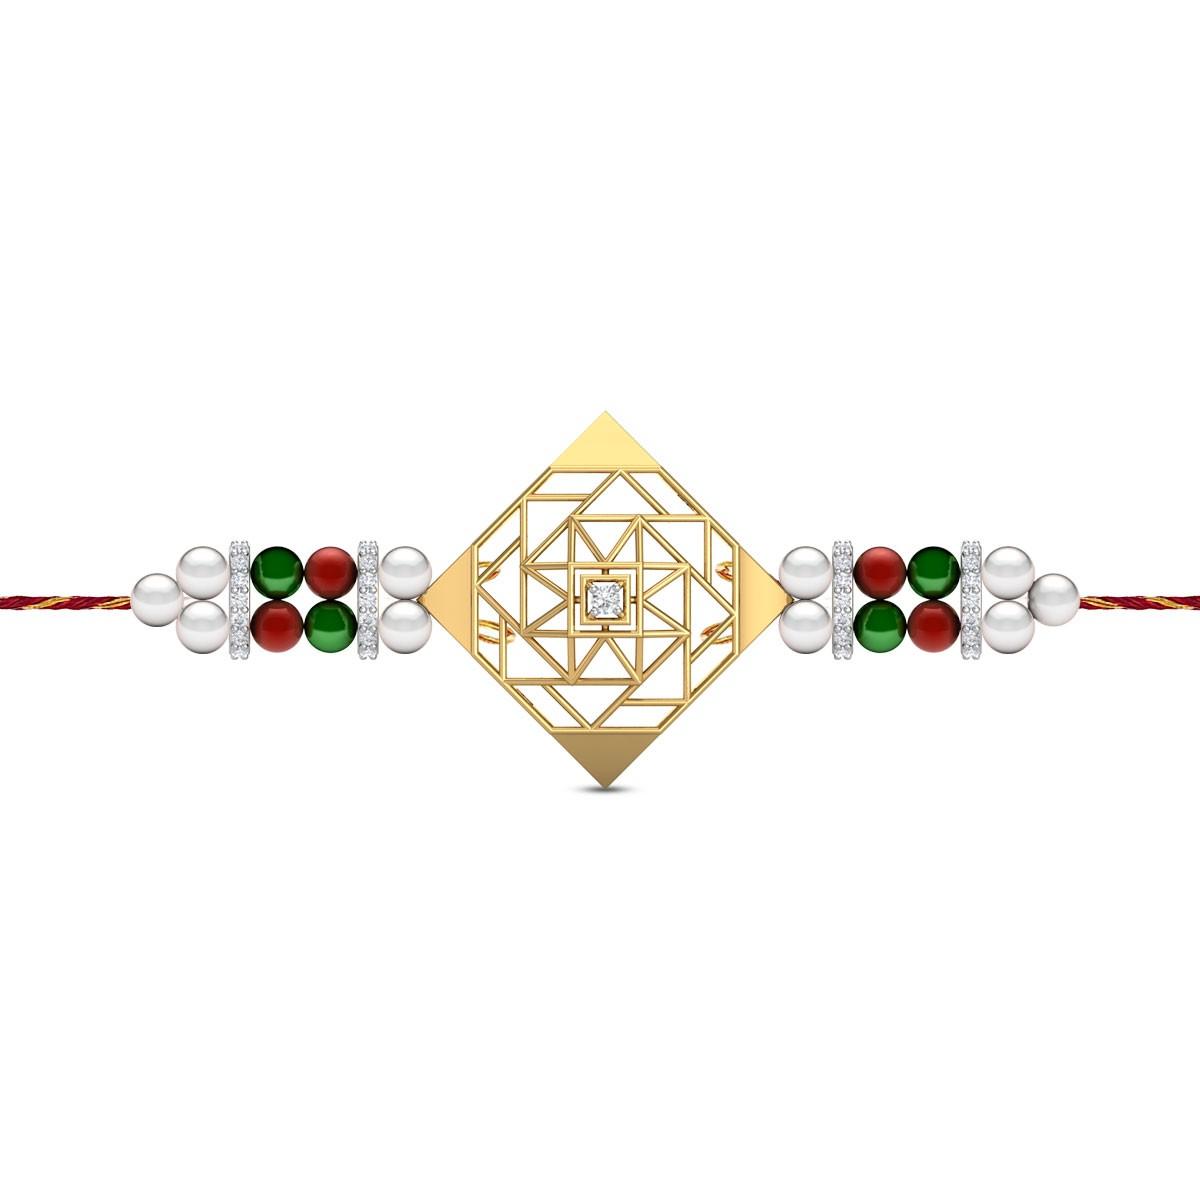 Kith & Kin Diamond Rakhi Set